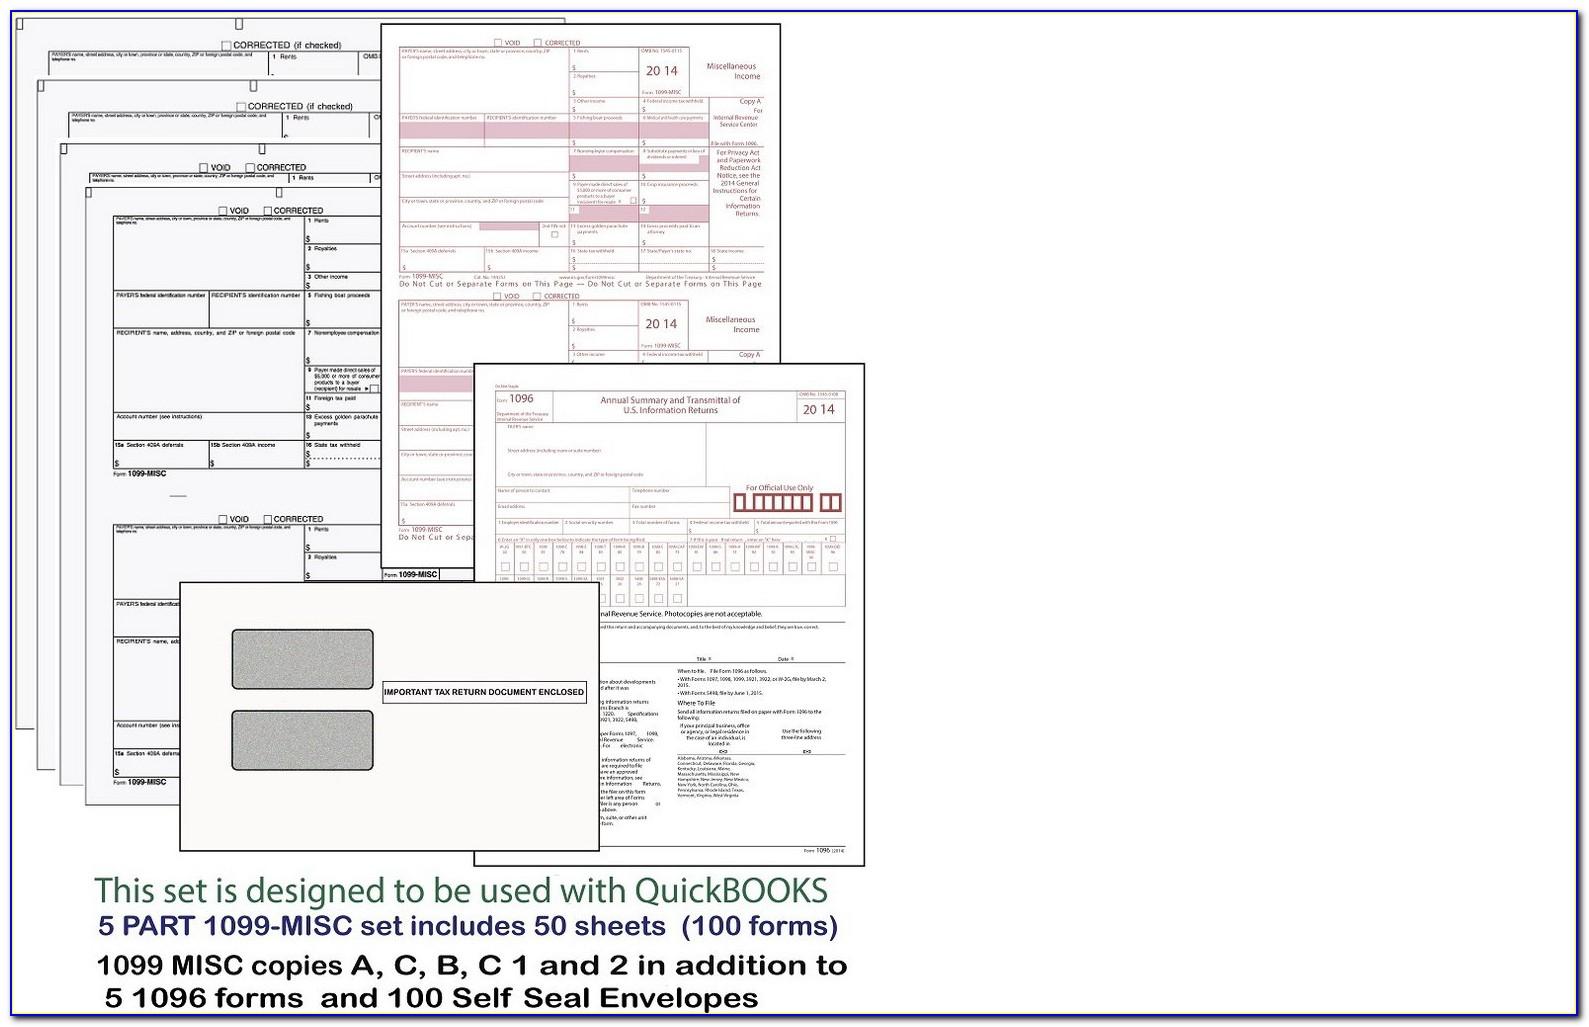 Quickbooks Desktop 1099 Forms